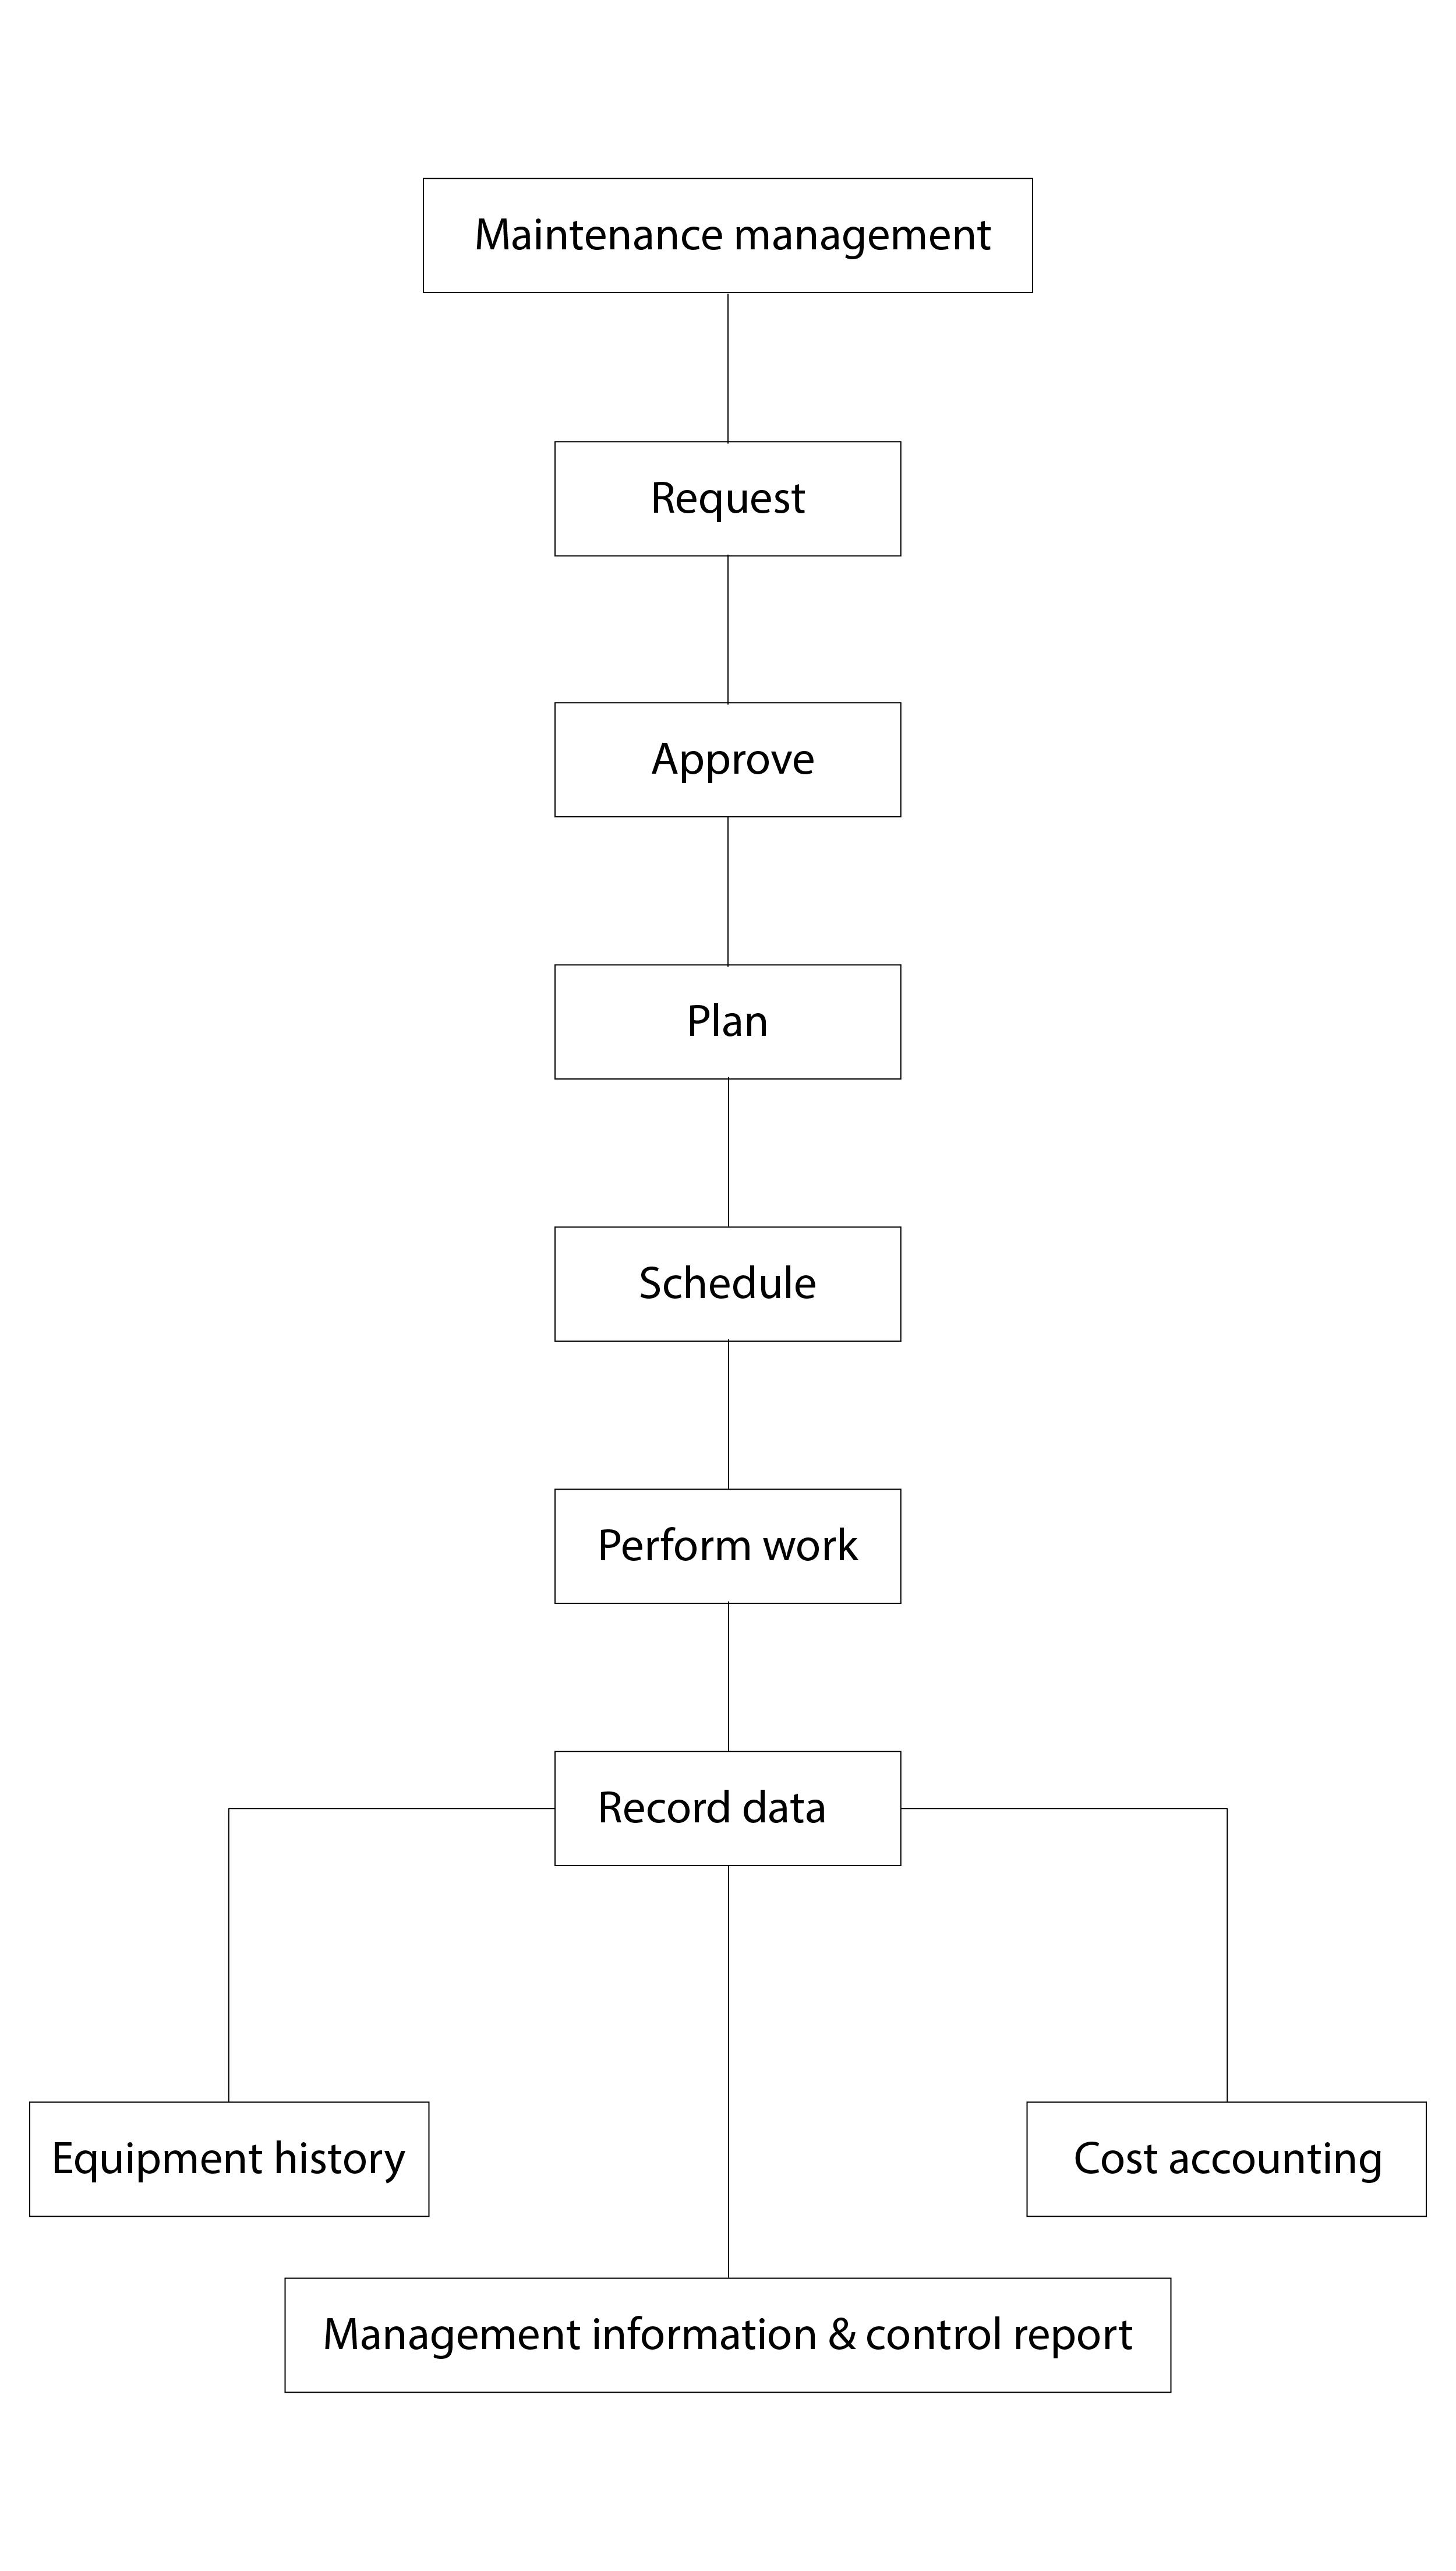 Computerized maintenance management system - Wikipedia